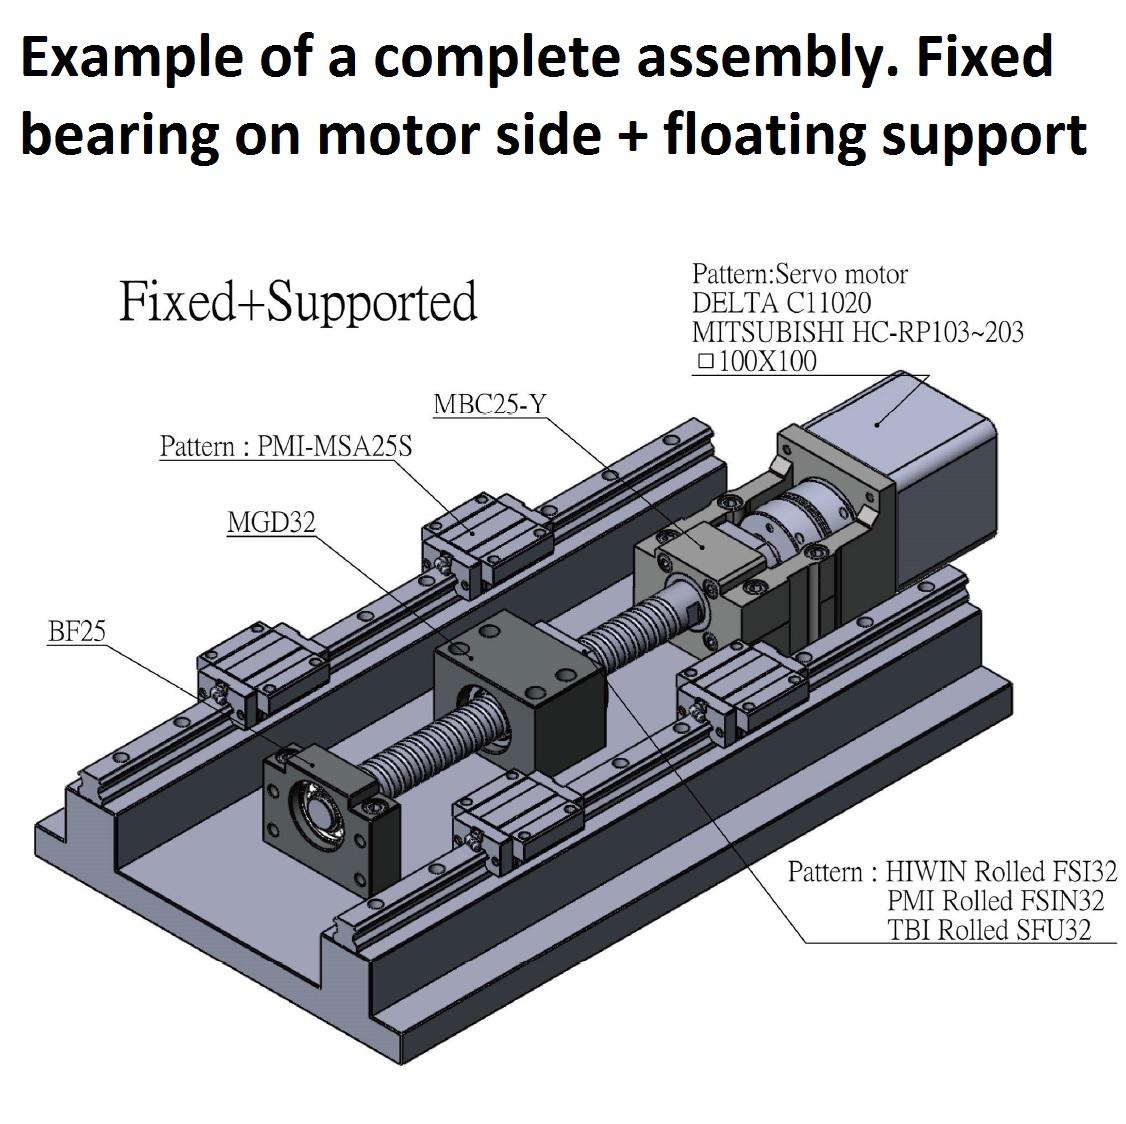 43854 100x100 servo motor bracket mbc25x example assembly 2